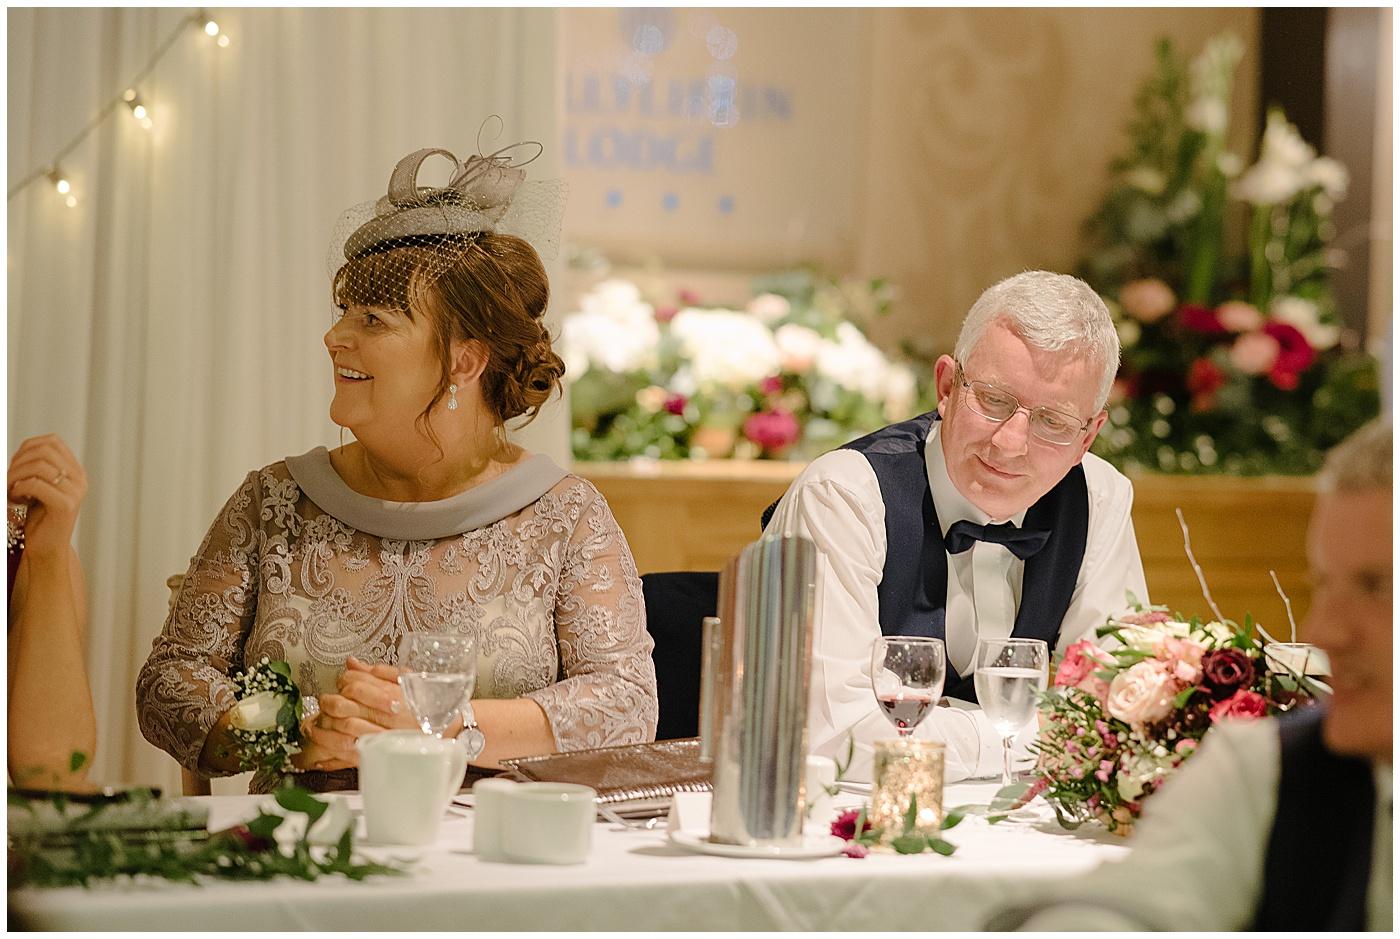 lissan-house-wedding-jude-browne-photography_0117.jpg